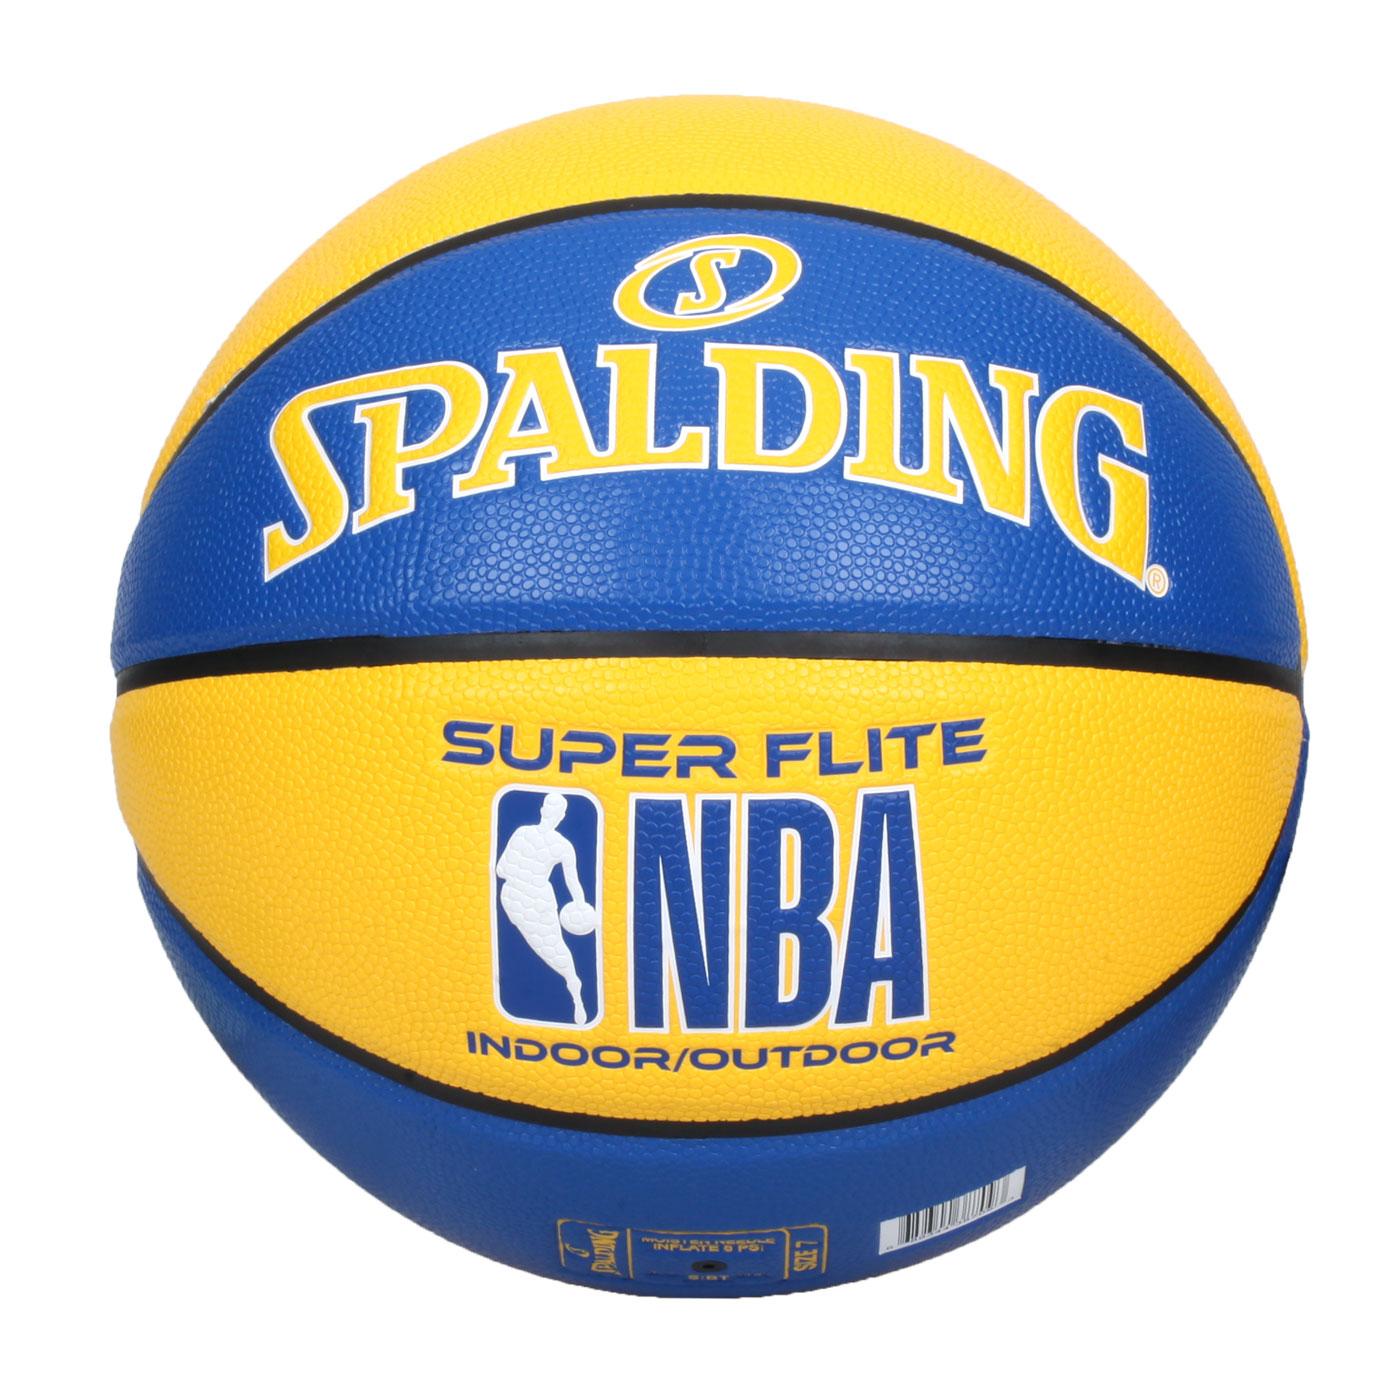 SPALDING NBA SUPER FLITE系列#7號合成皮籃球 SPA38709 SPA76350 - 藍黃